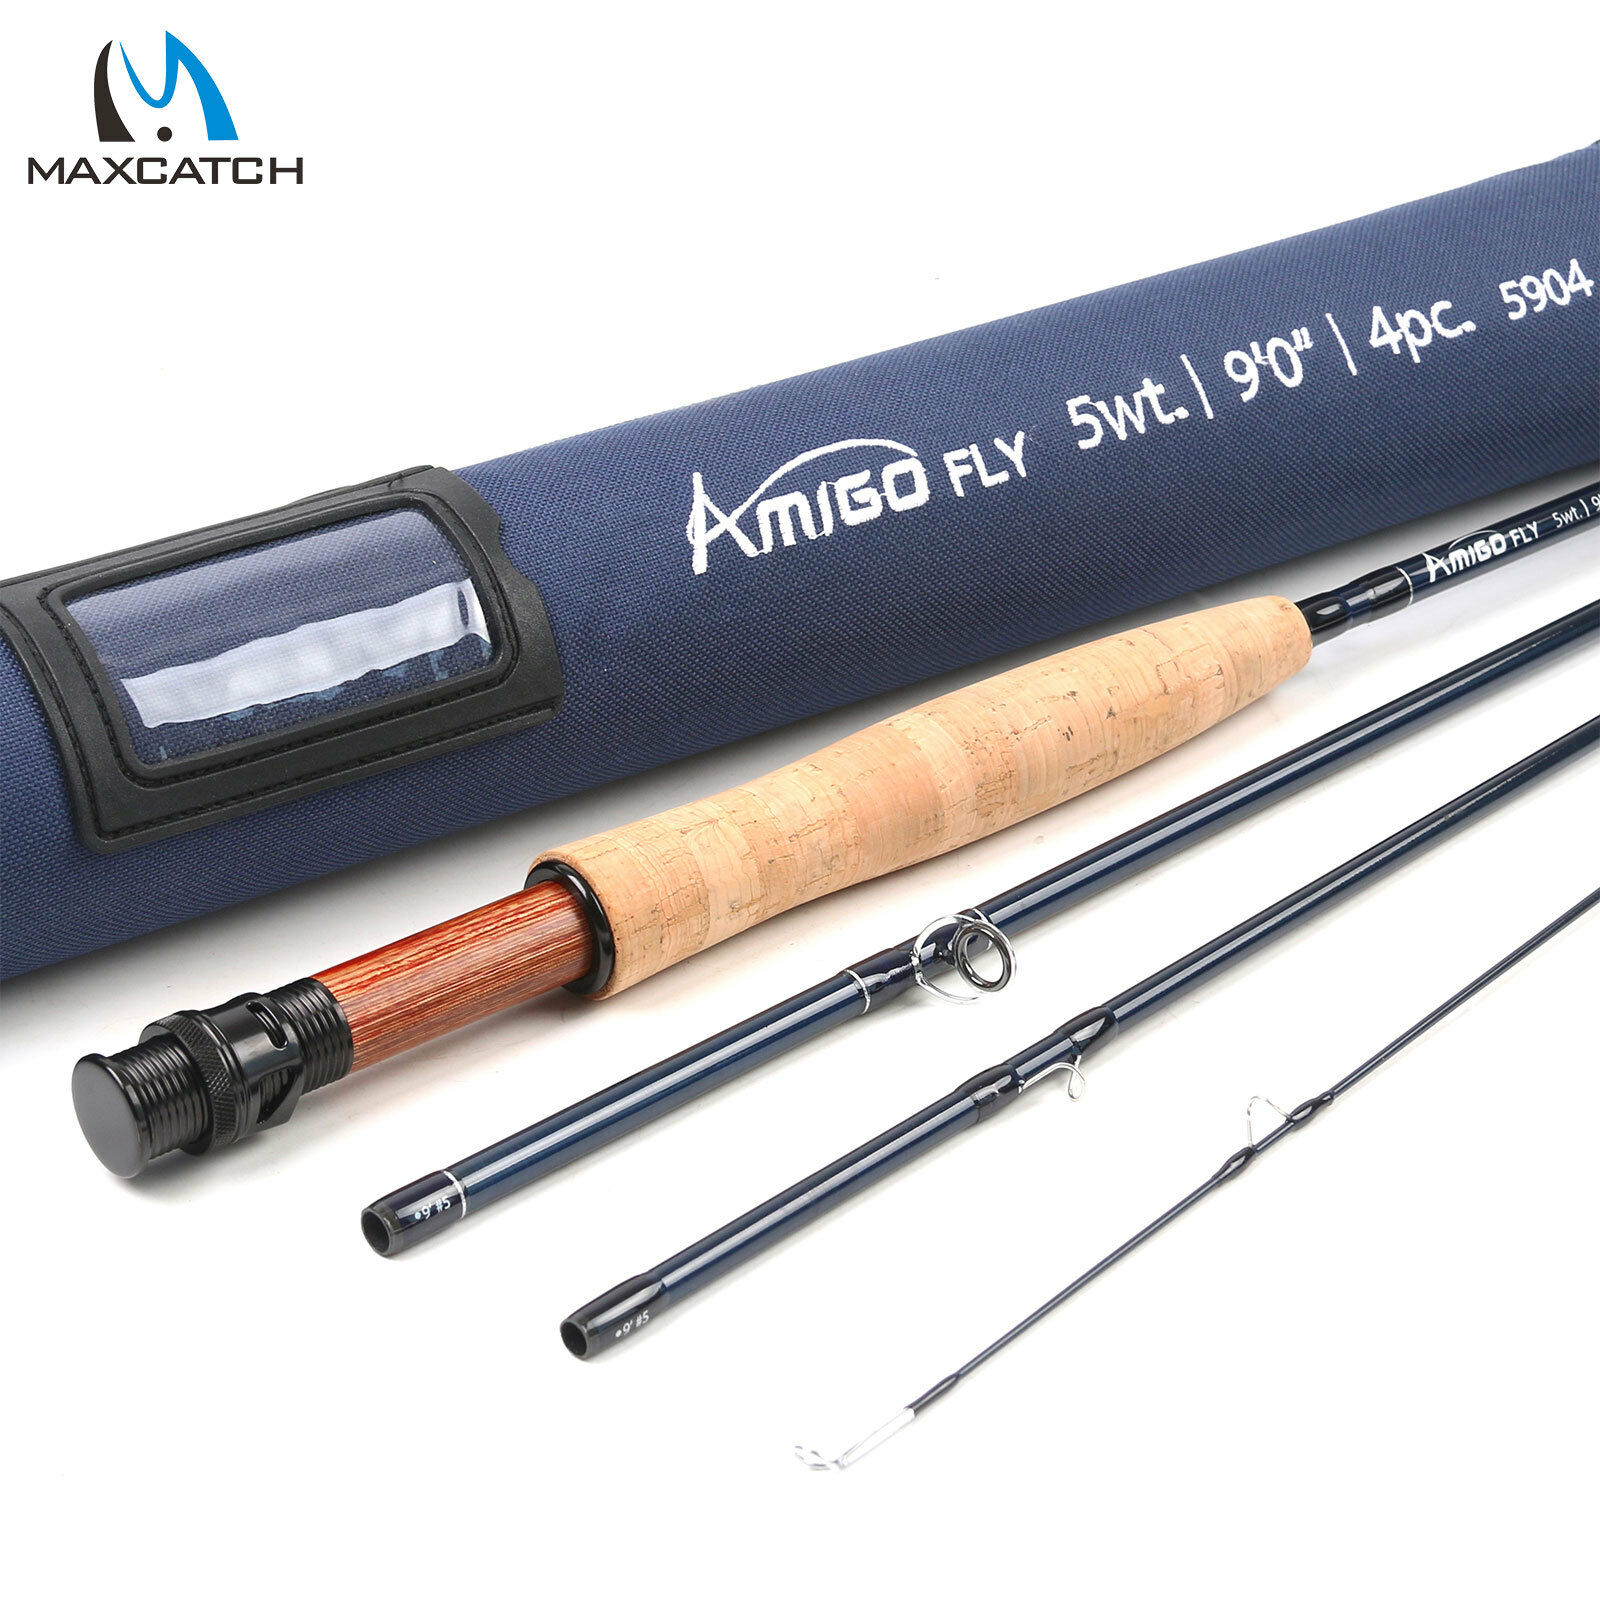 Maxcatch Amigo Fly Rod 4 5 6 7 8wt 9ft Fast Action IM10 Carbon Fiber Fishing Rod